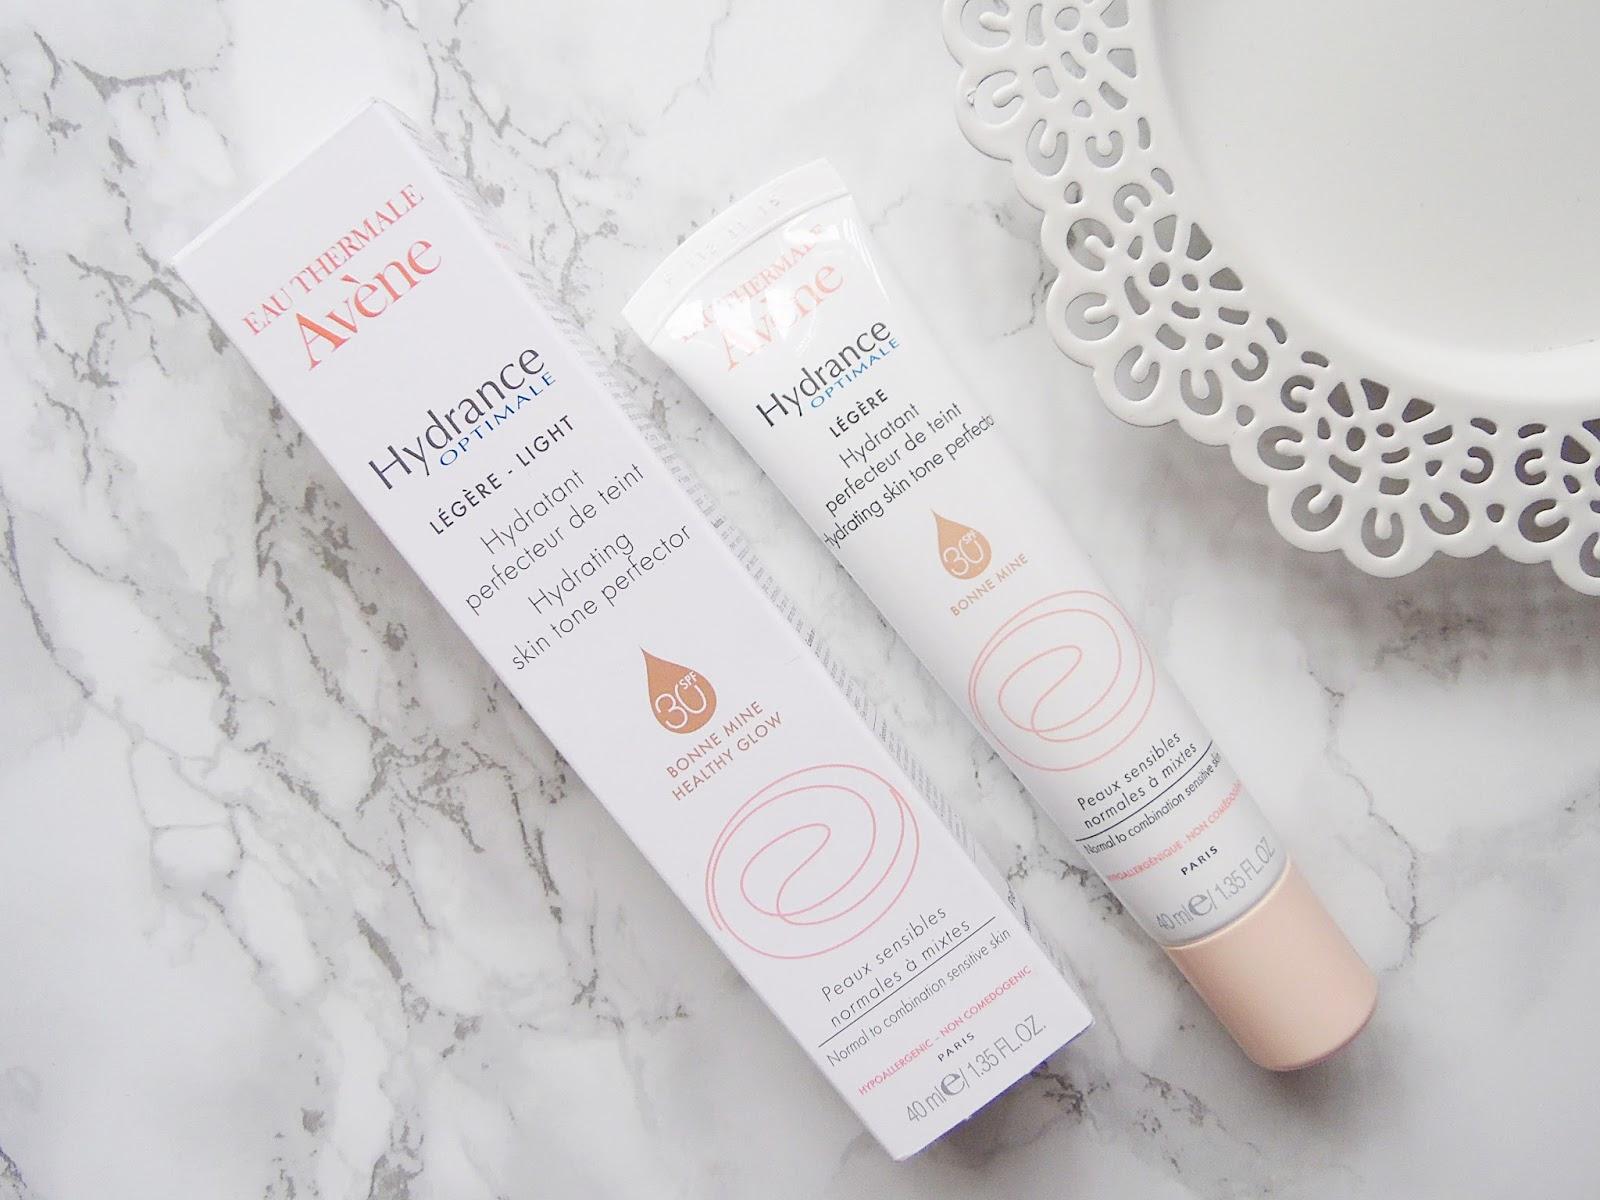 Avene Hydrance Skin Tone Perfector